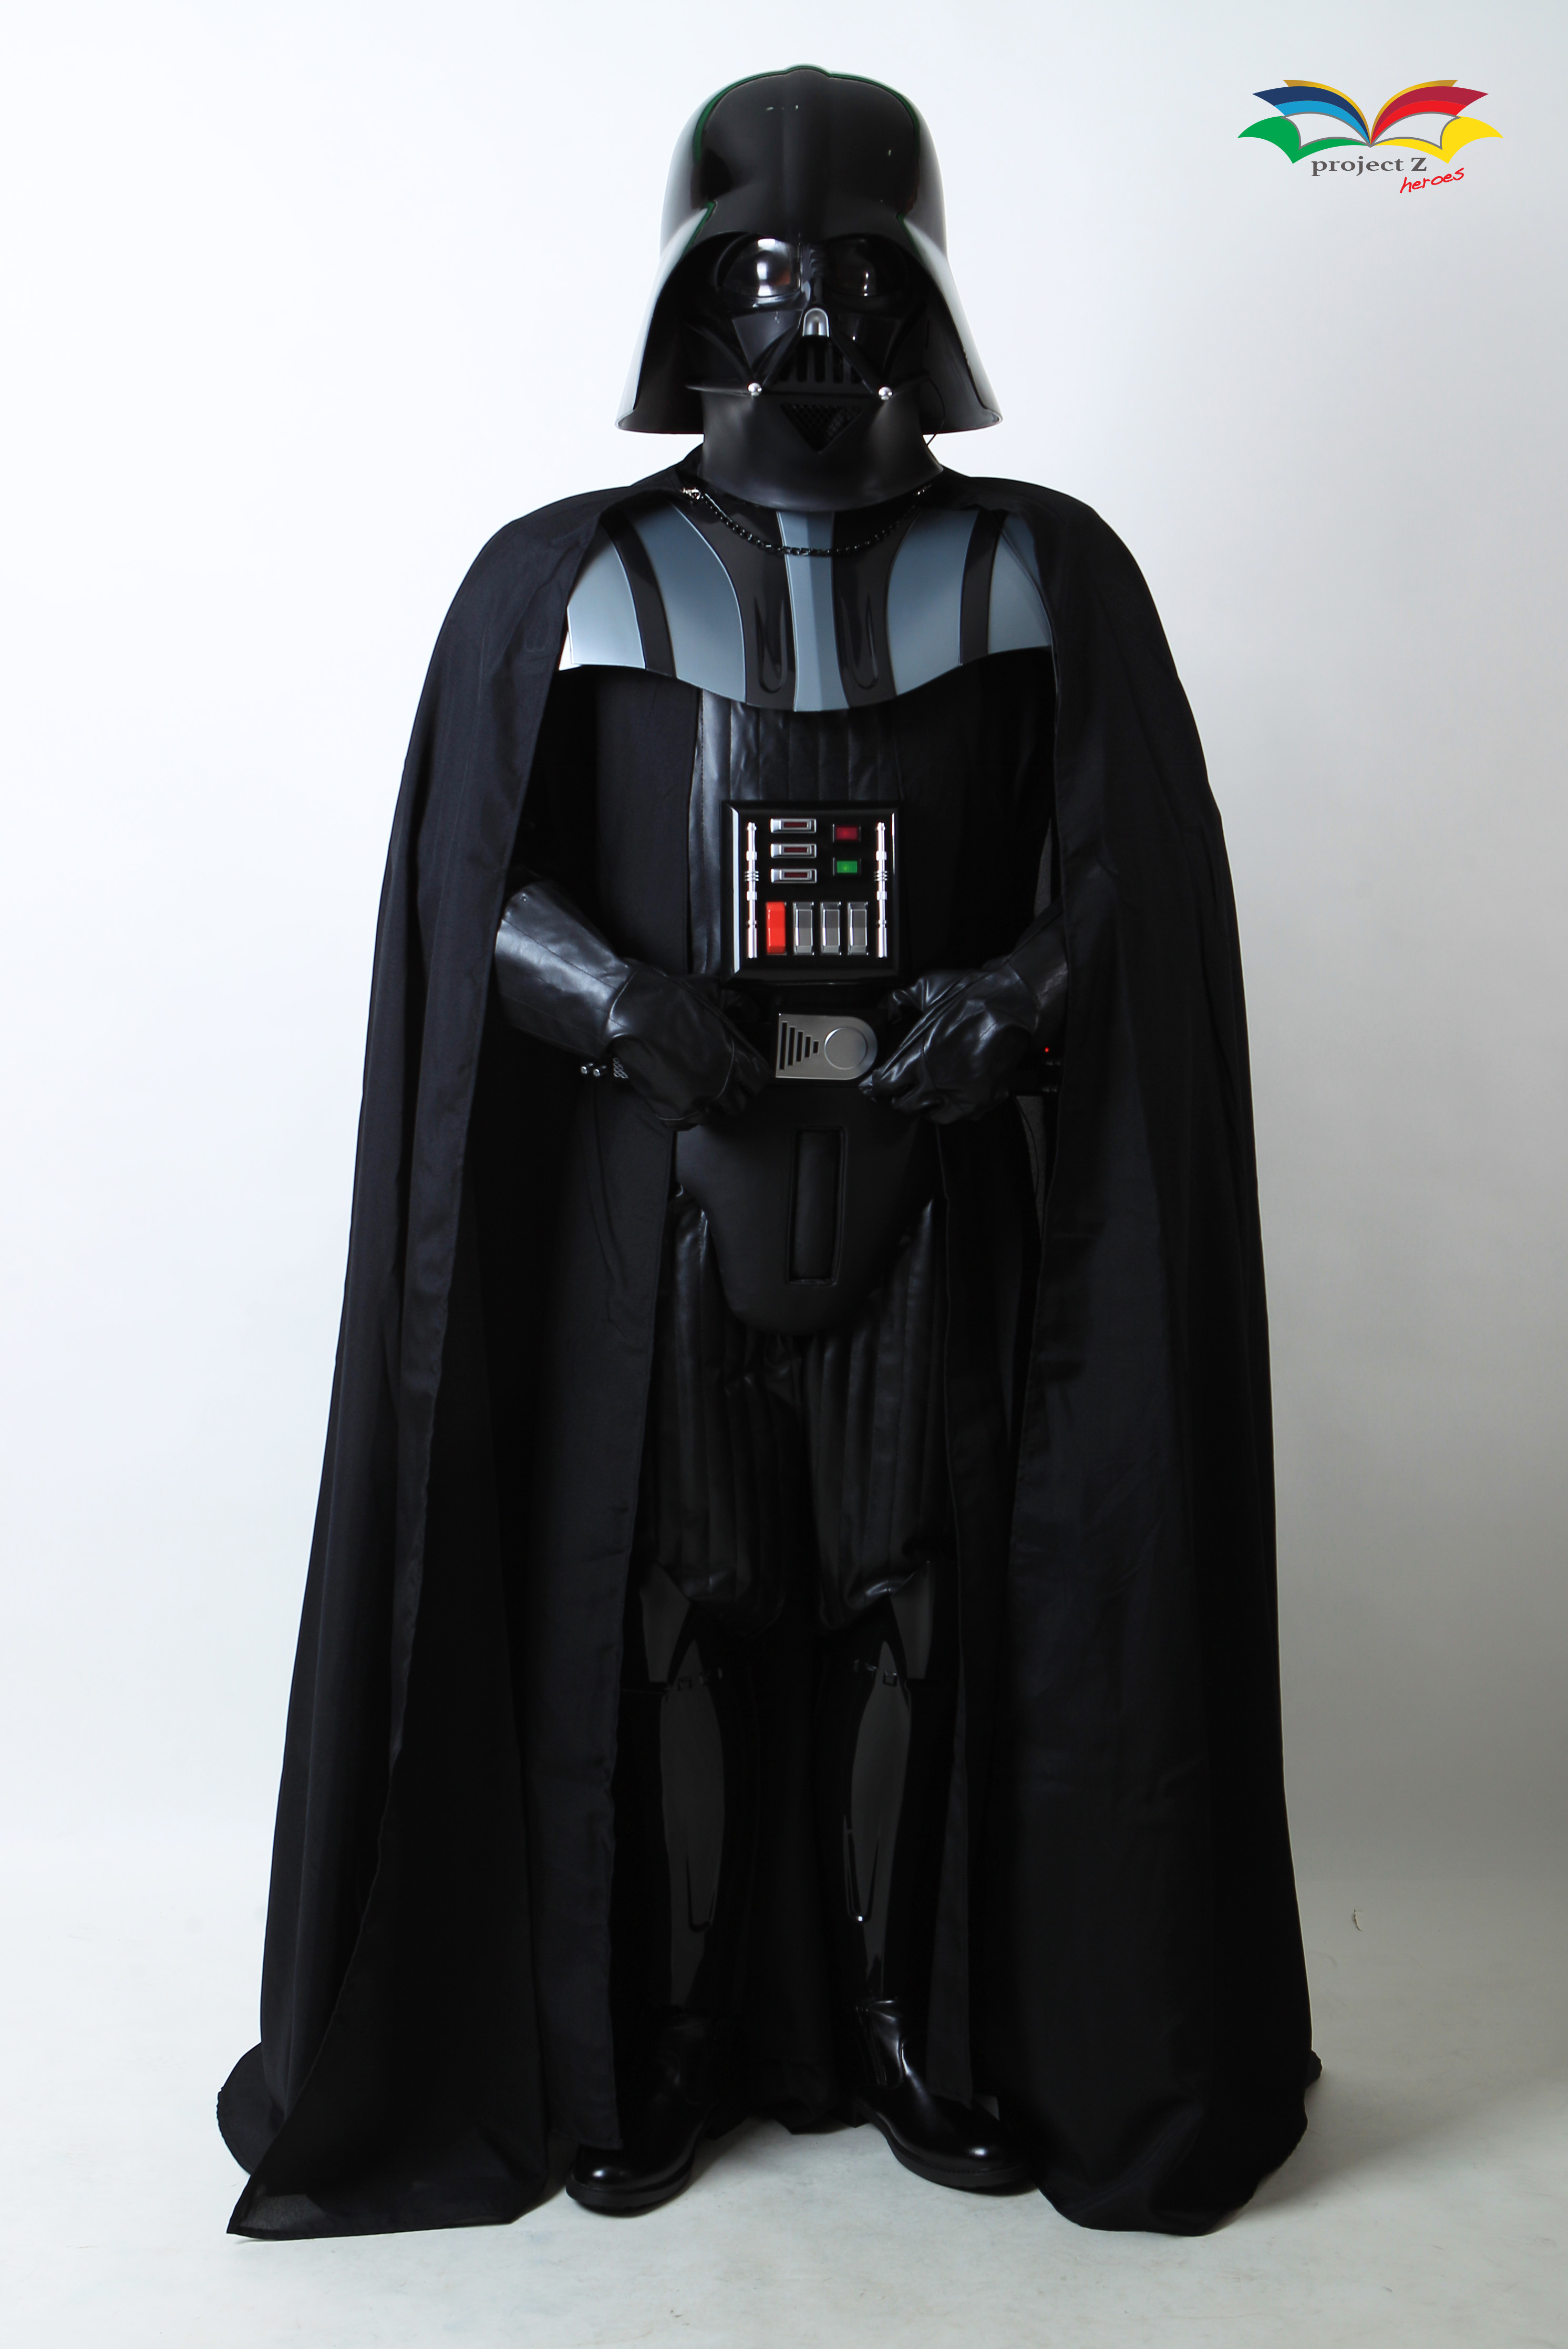 Darth Vader costume full front